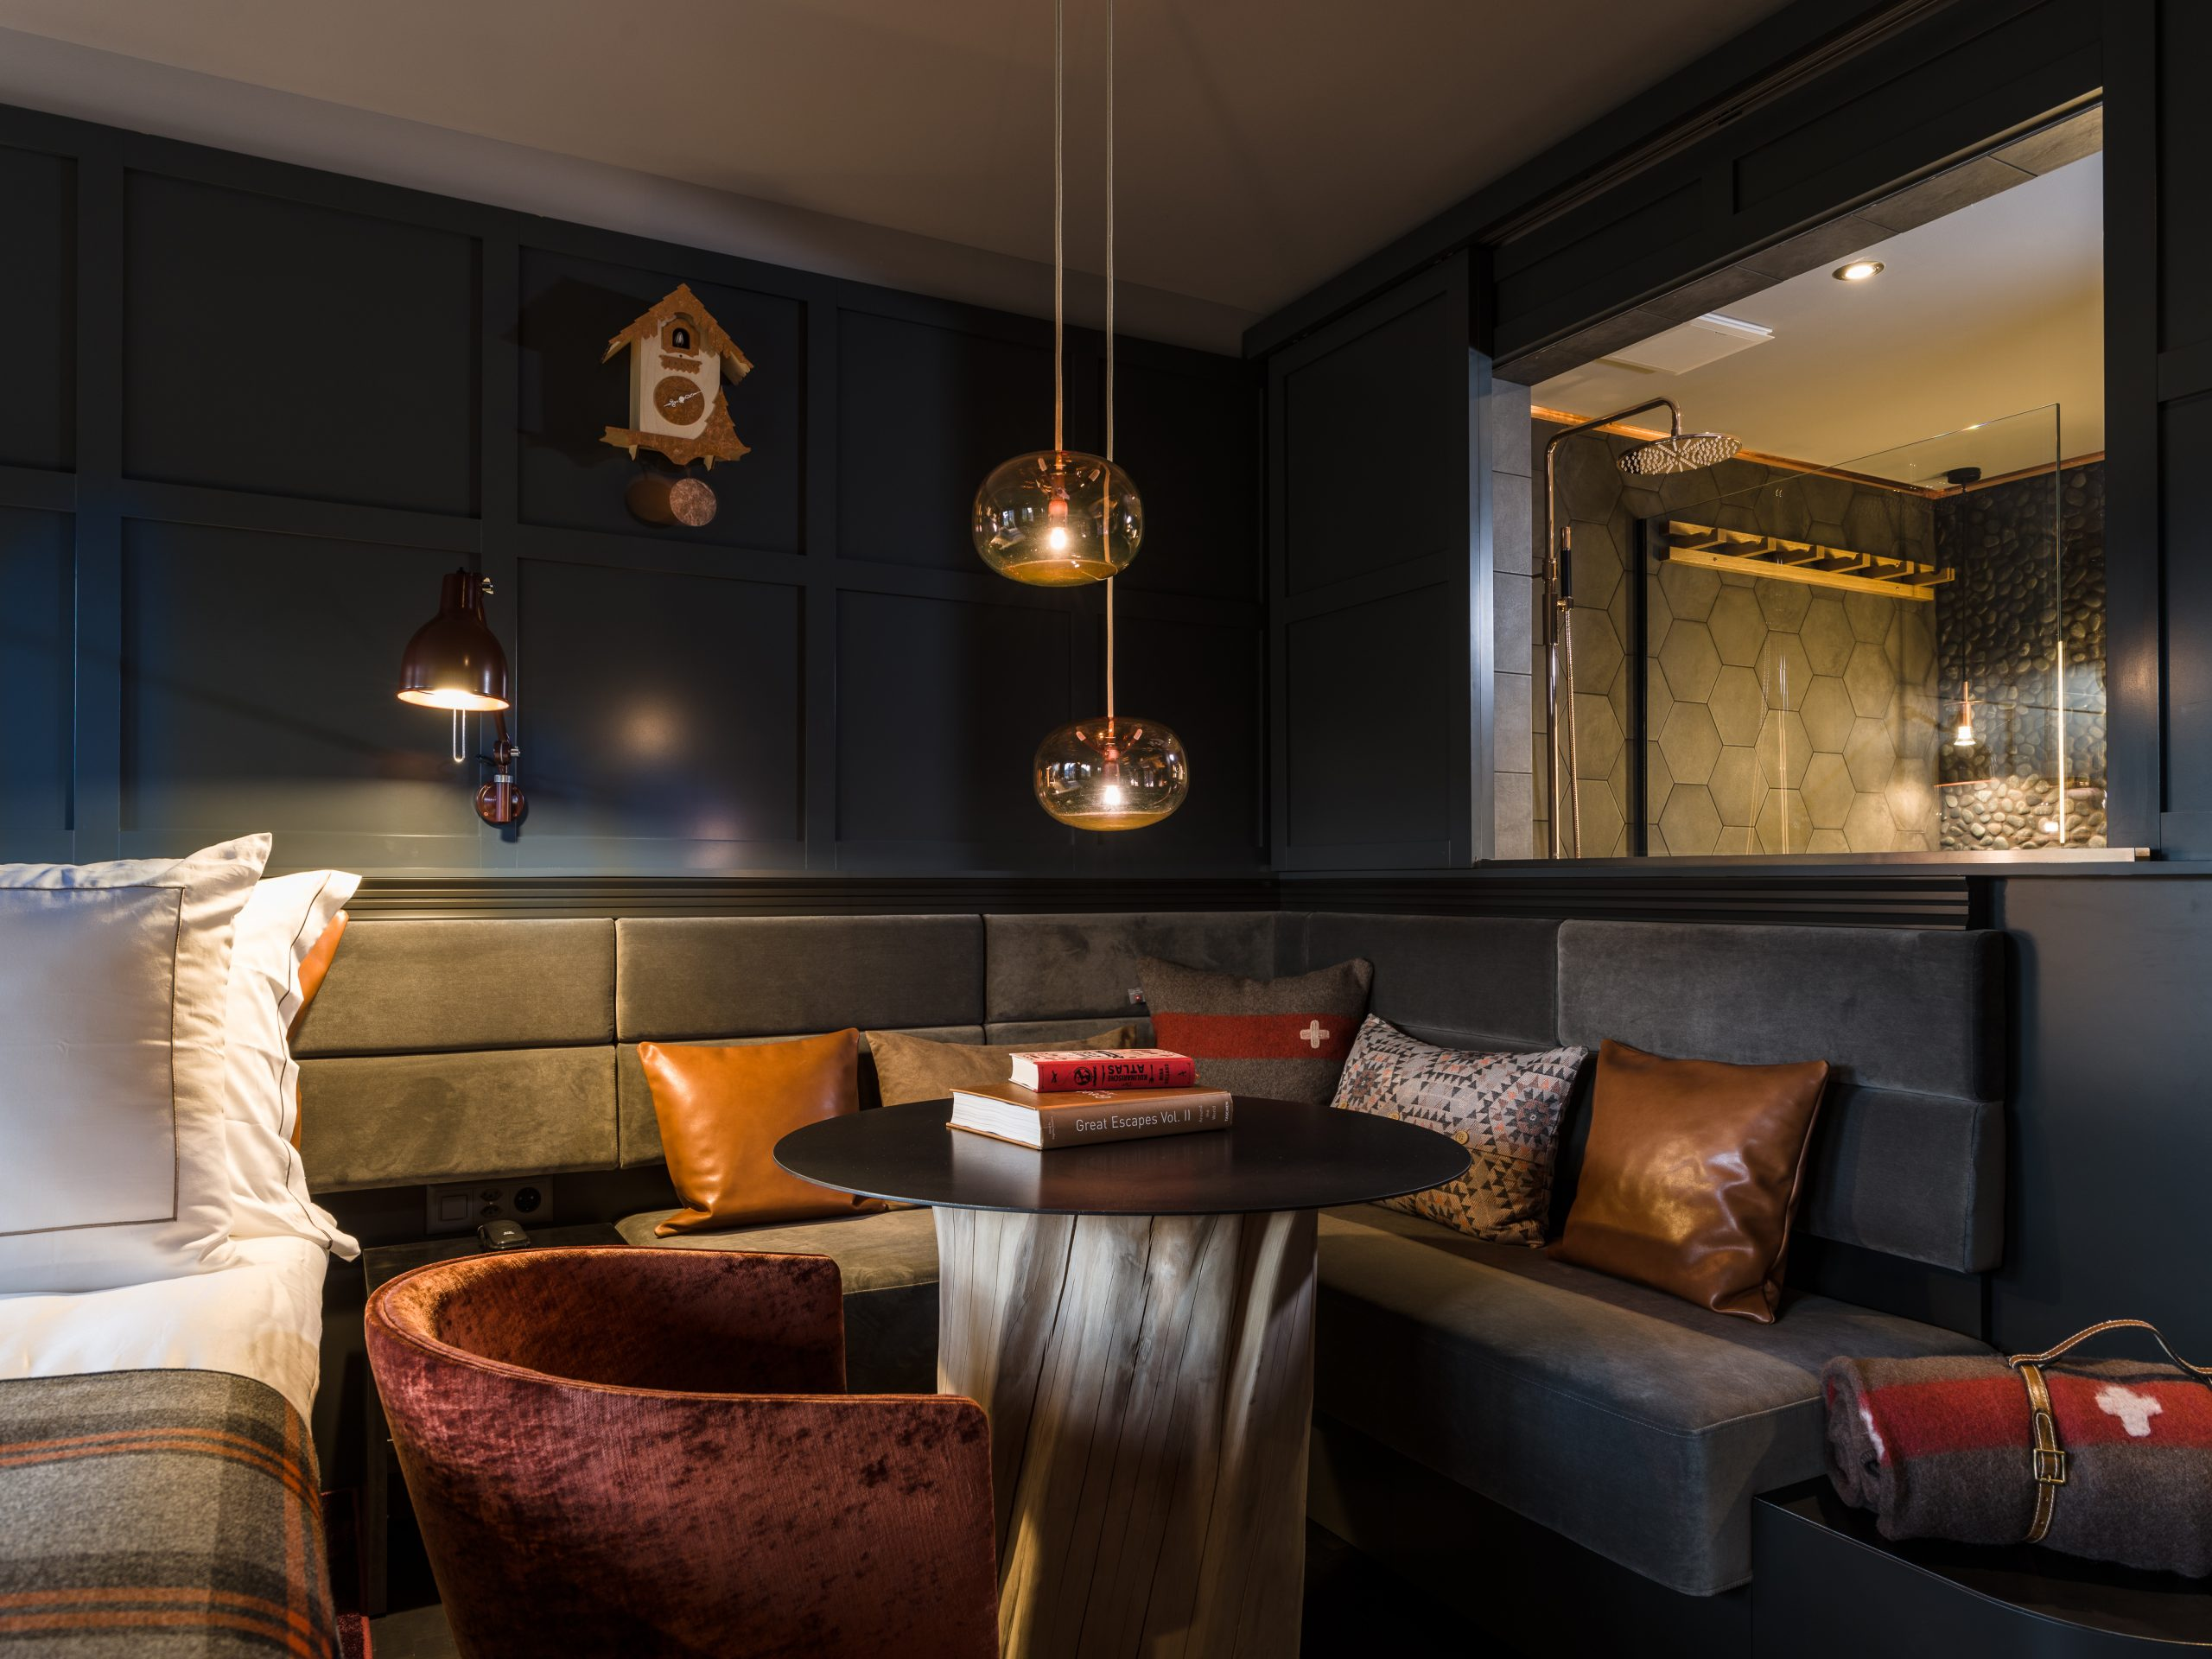 zurich Fall In Love With The Top Interior Designers From Zurich Peter Kohler Innenarchitektur scaled